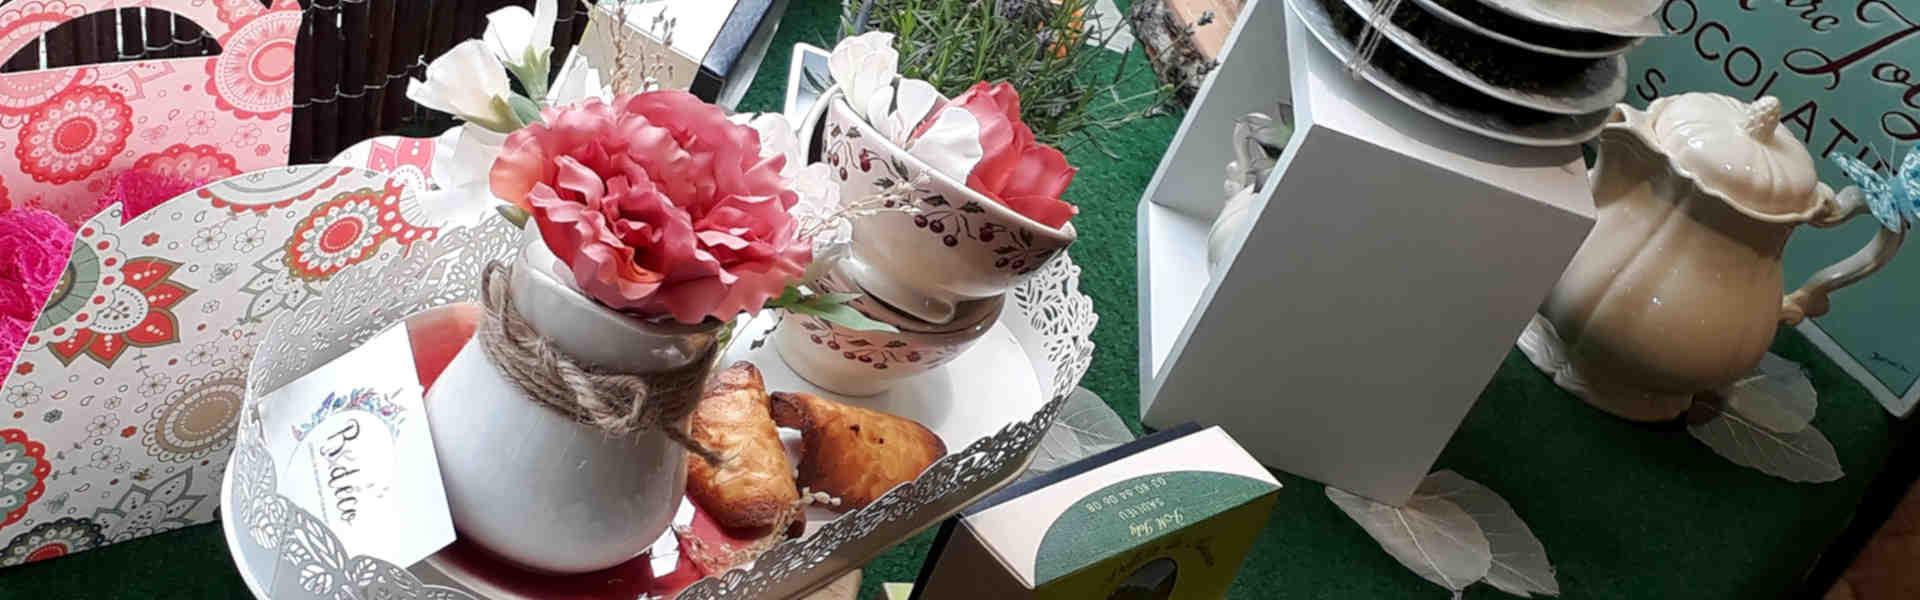 Vitrine printanière à la pâtisserie Joly de Saulieu mai 2019